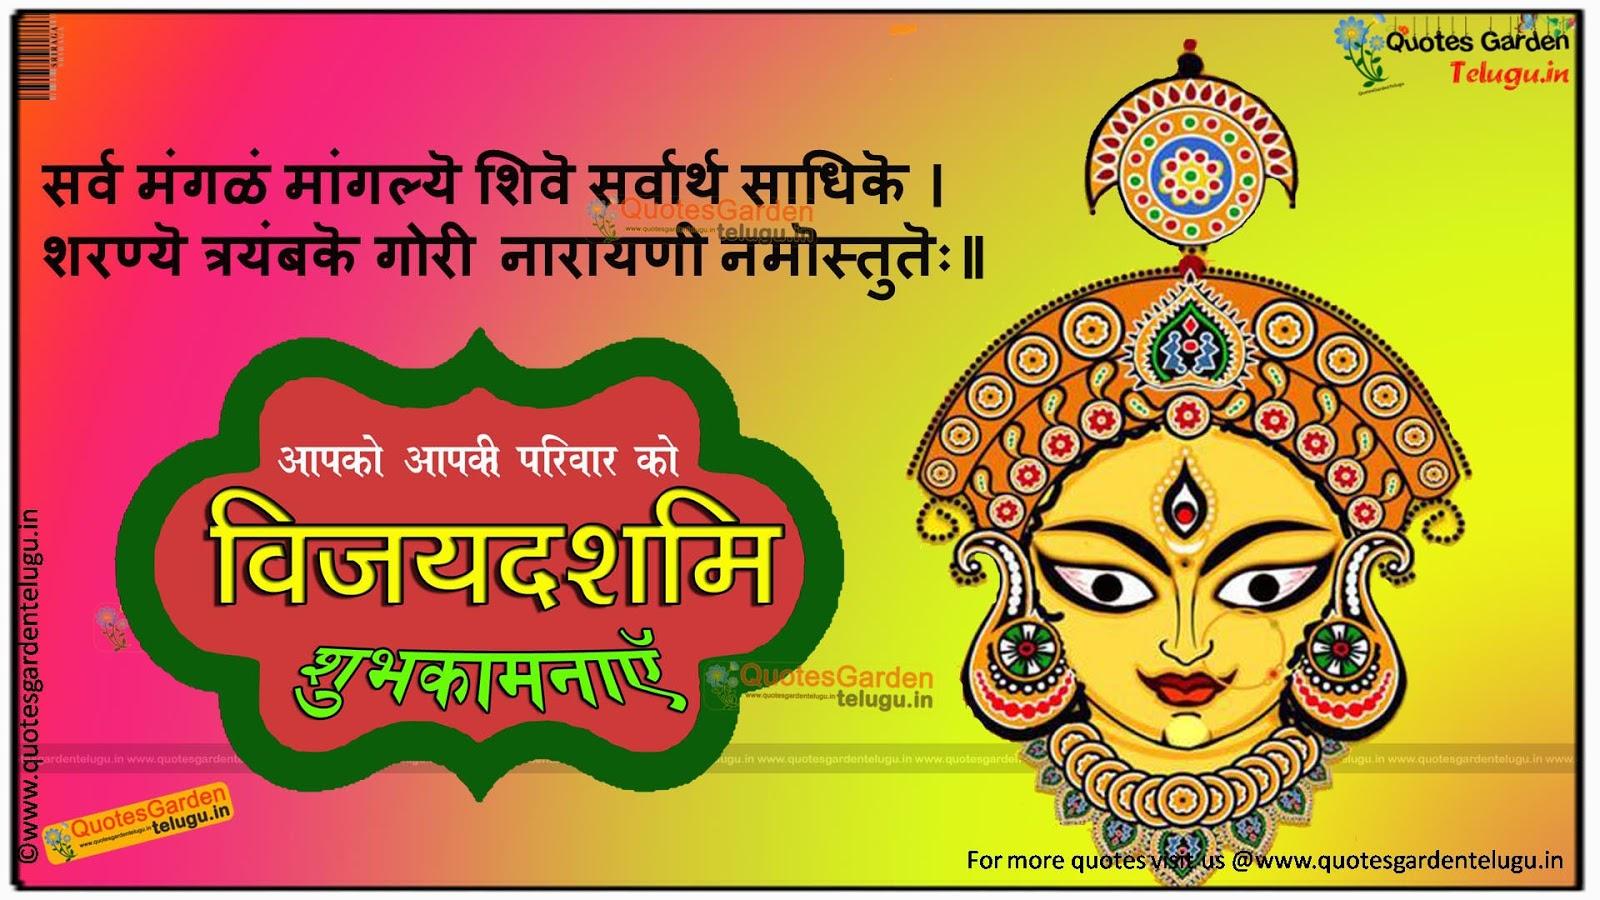 Happy dussehra greetings 2017 best vijayadashmi greeting cards happy2bdussehra2bgreetings2bwishes2bquotes2bin2bhindi kristyandbryce Choice Image